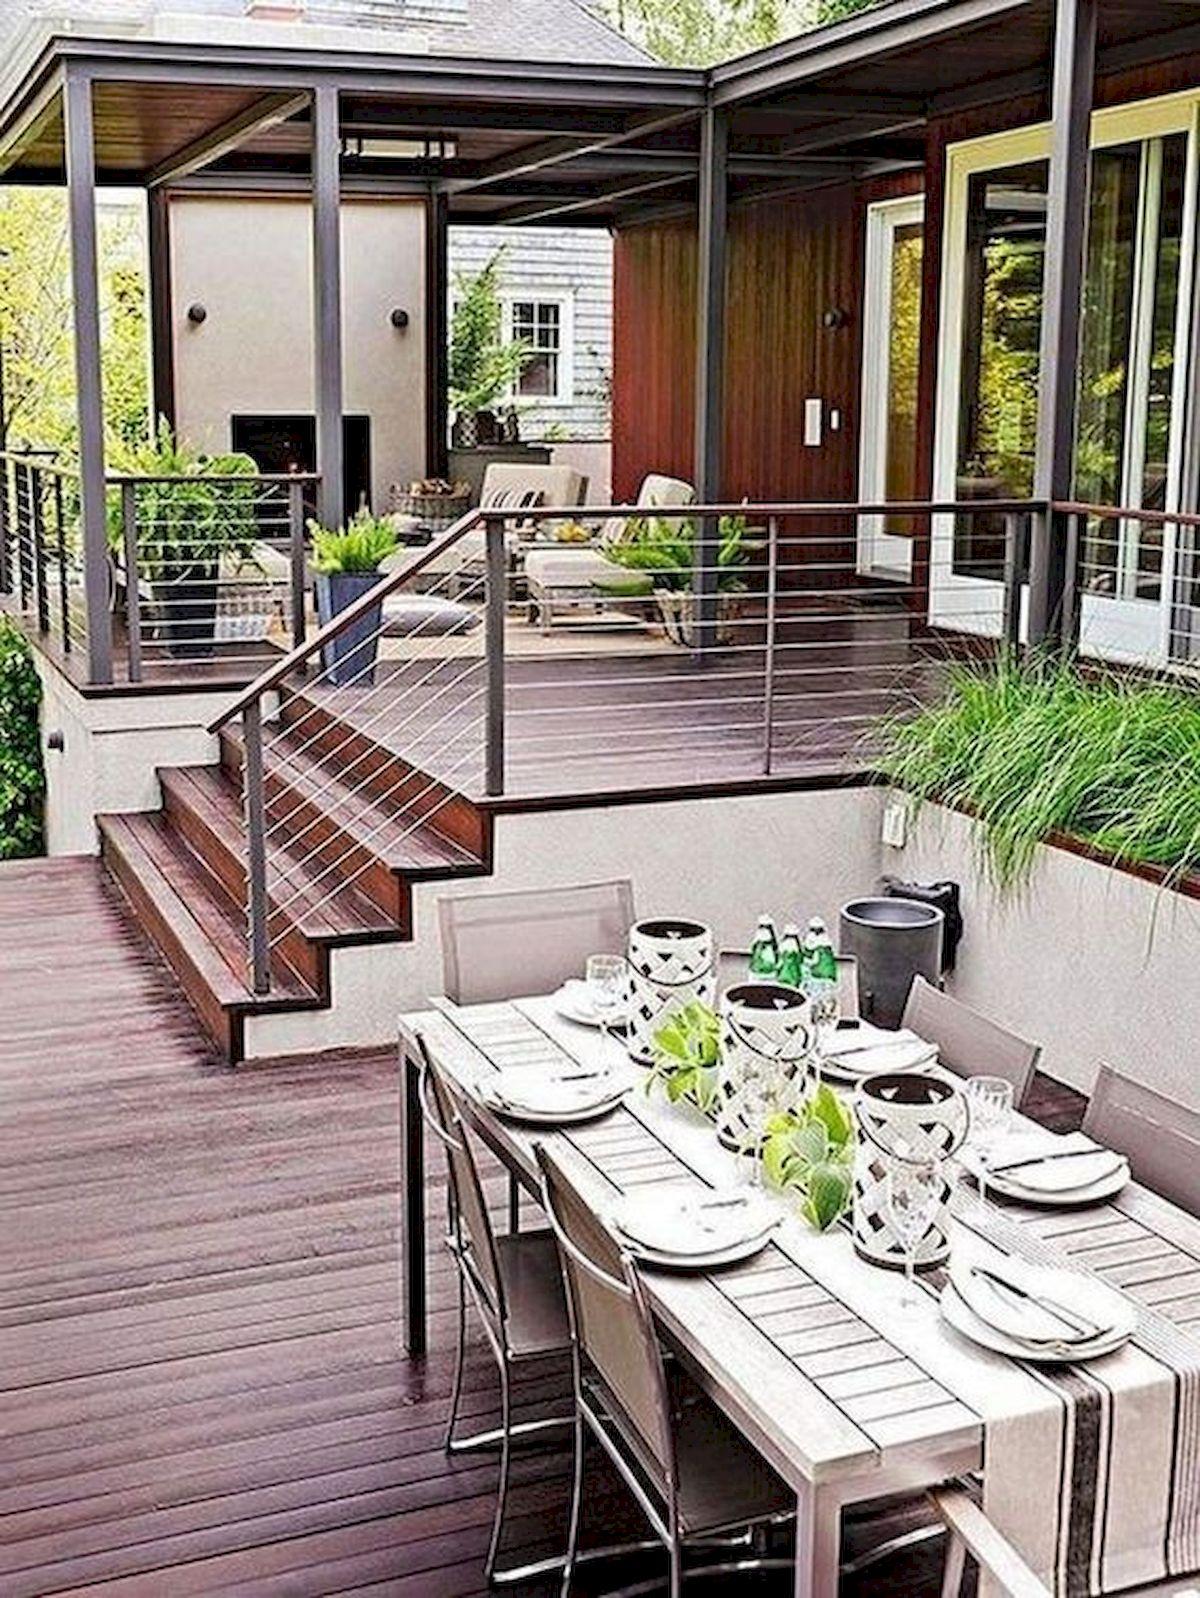 50 Fantastic Backyard Patio and Decking Design Ideas (44)